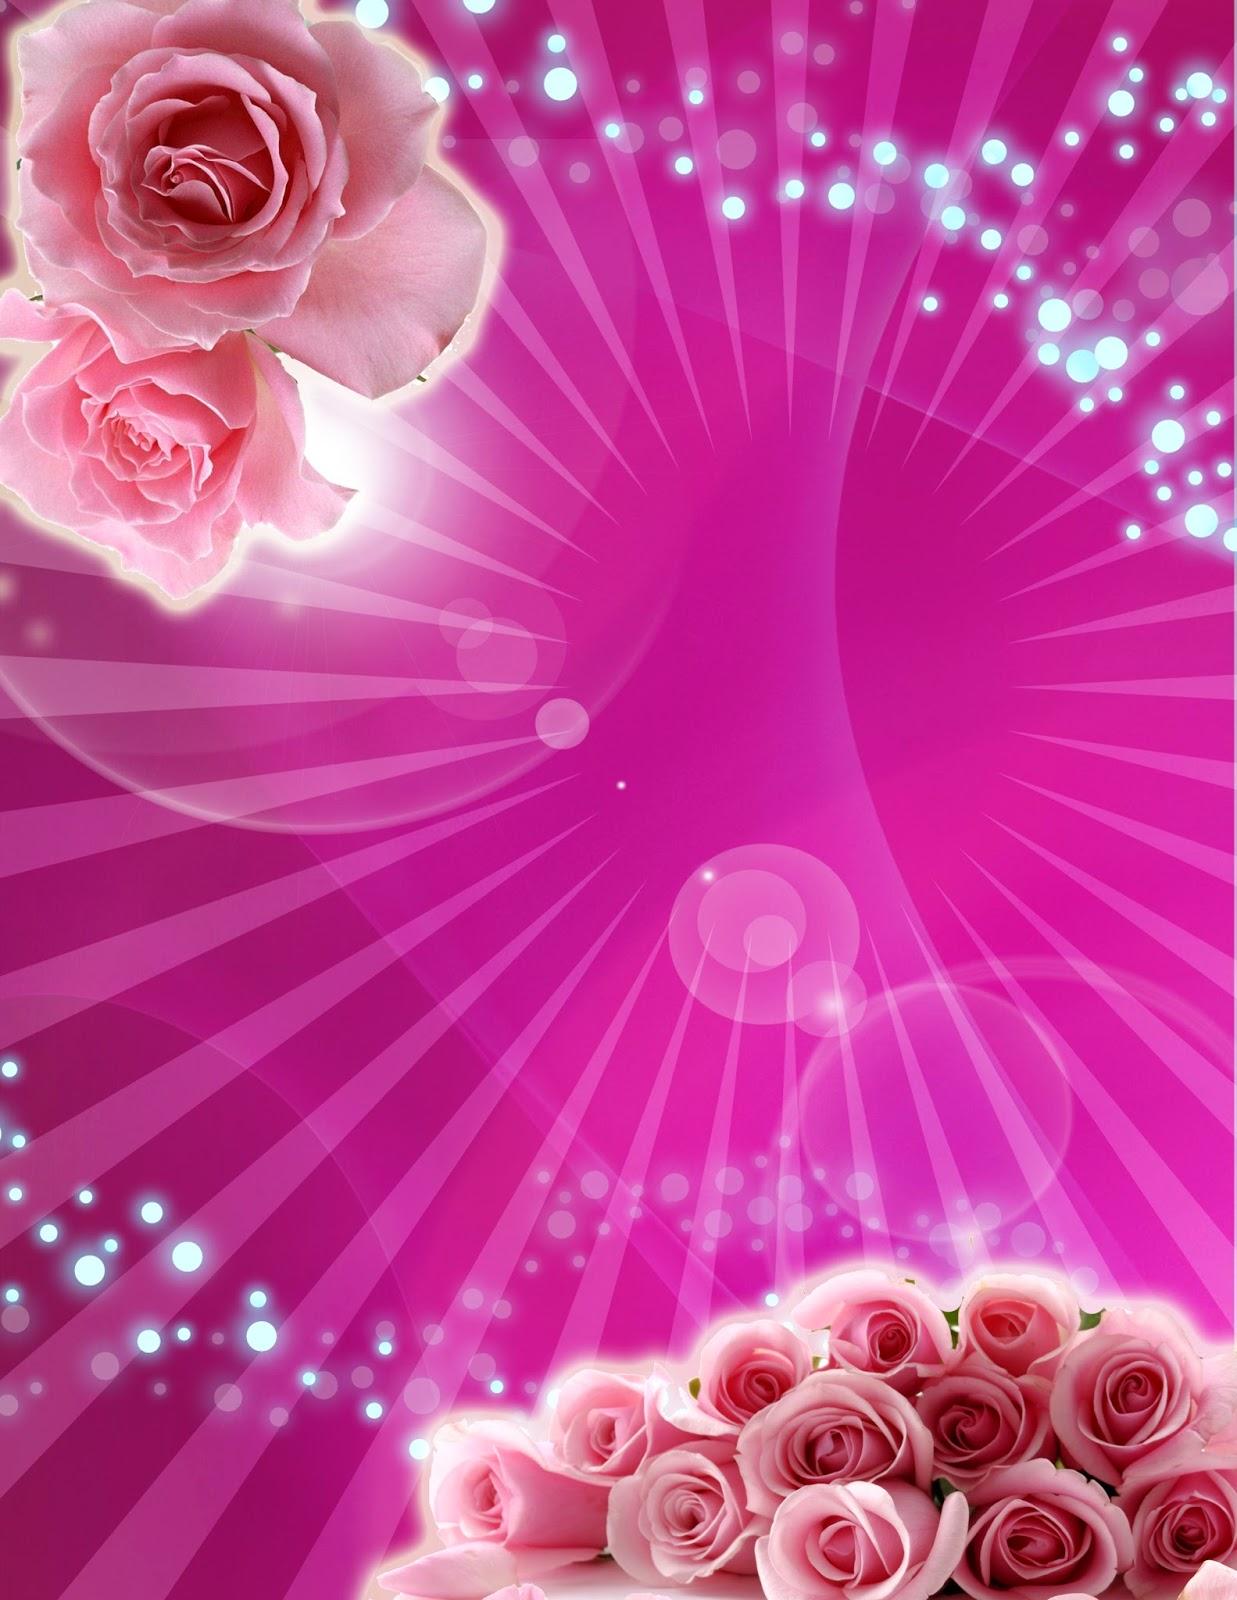 tarjeta de invitaci n de 15 a os fucsia con rosas rosa gratis artes davinci ideas con estilo. Black Bedroom Furniture Sets. Home Design Ideas